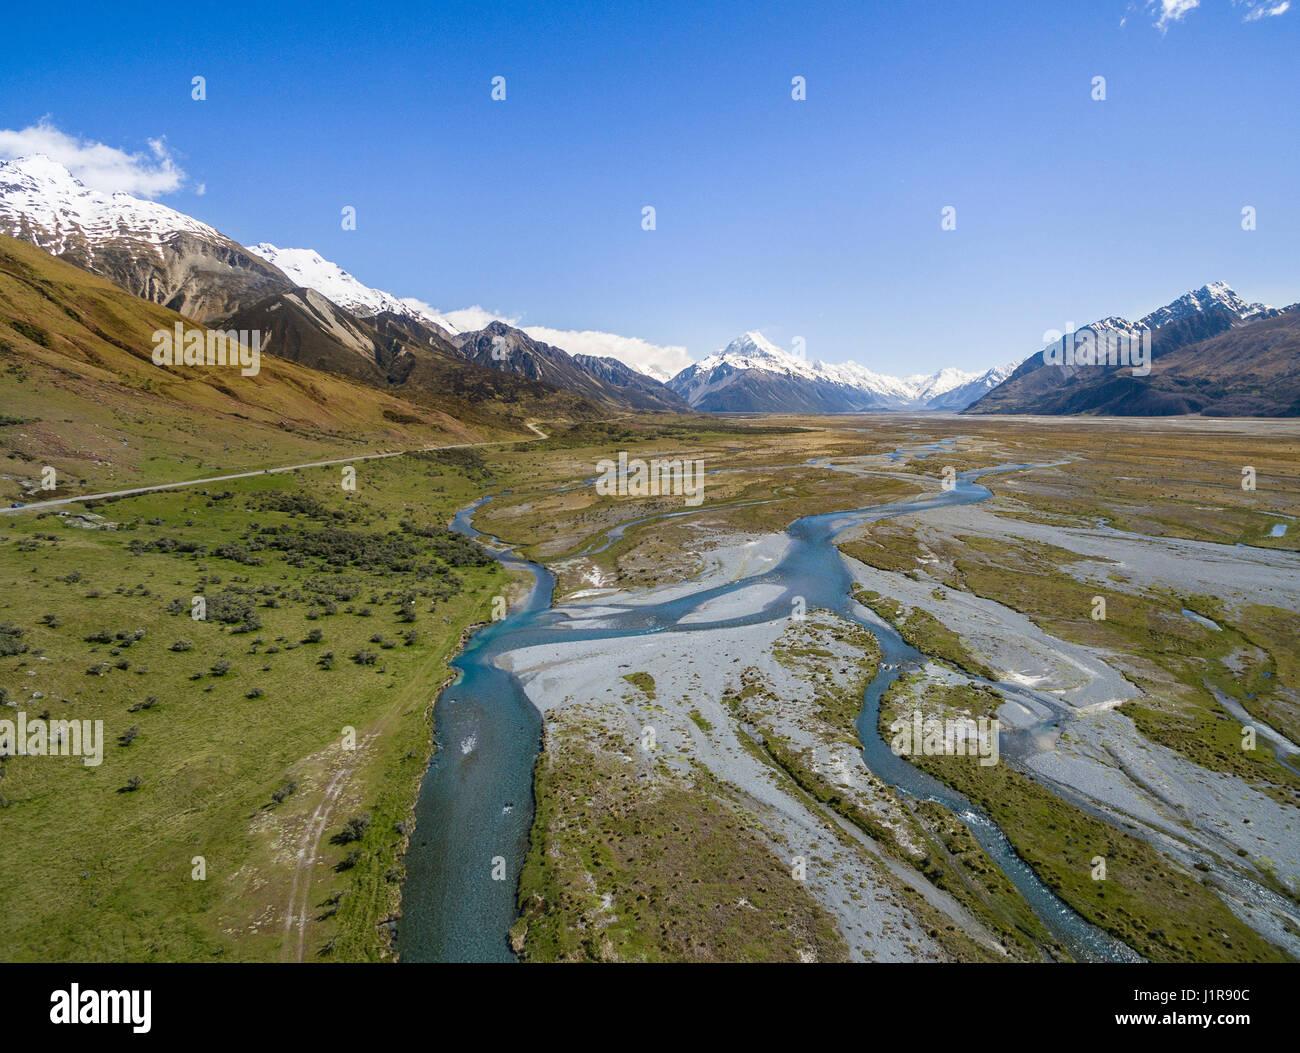 Breiten Flussbett des Flusses Tasman hinten Mount Cook, Canterbury Region Southland, Neuseeland Stockbild